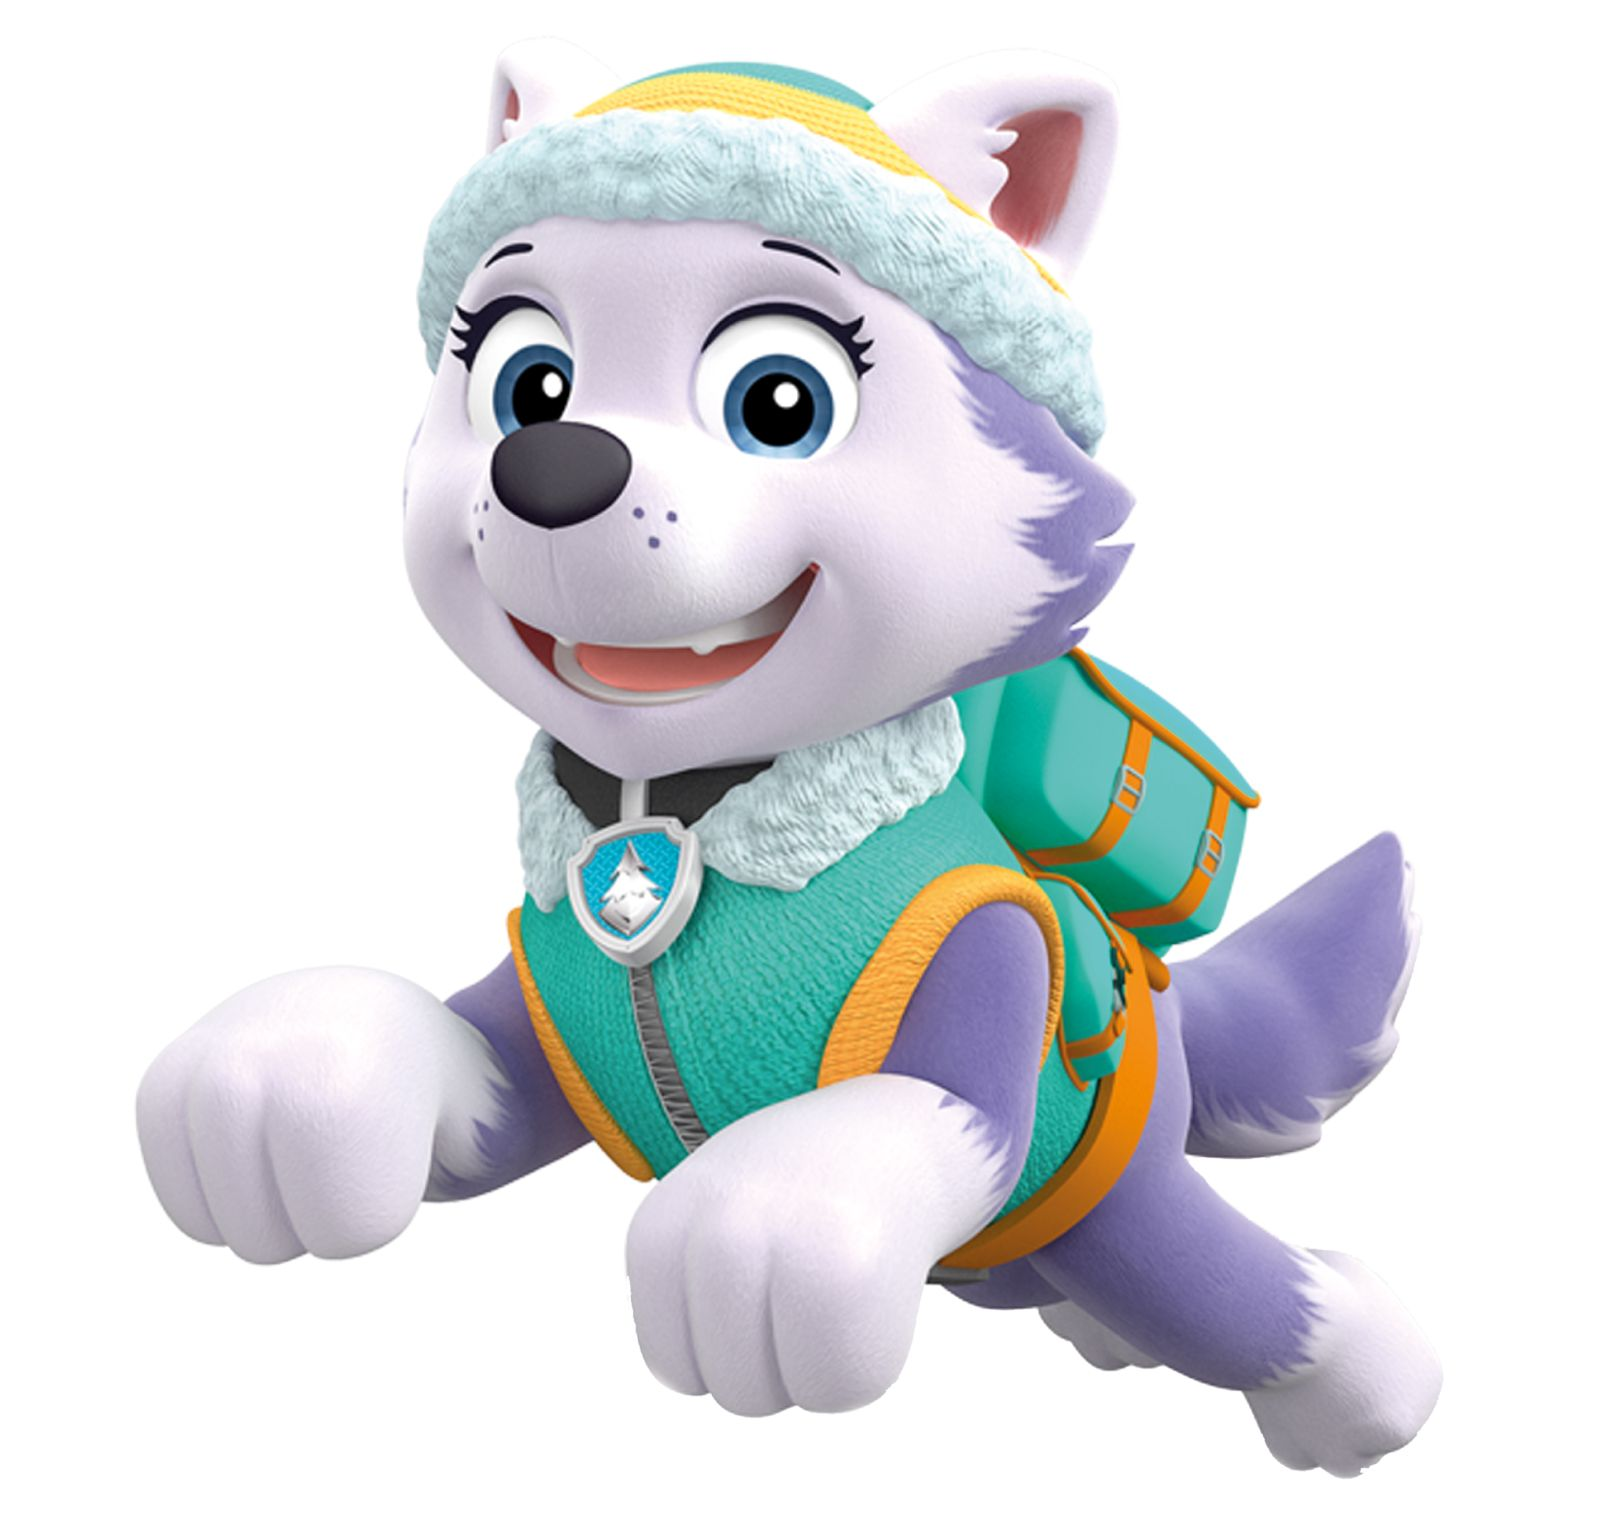 Cumpleanos Patrulla De La Pata Colorear Patrulla Canina Patrulla Canina Everest